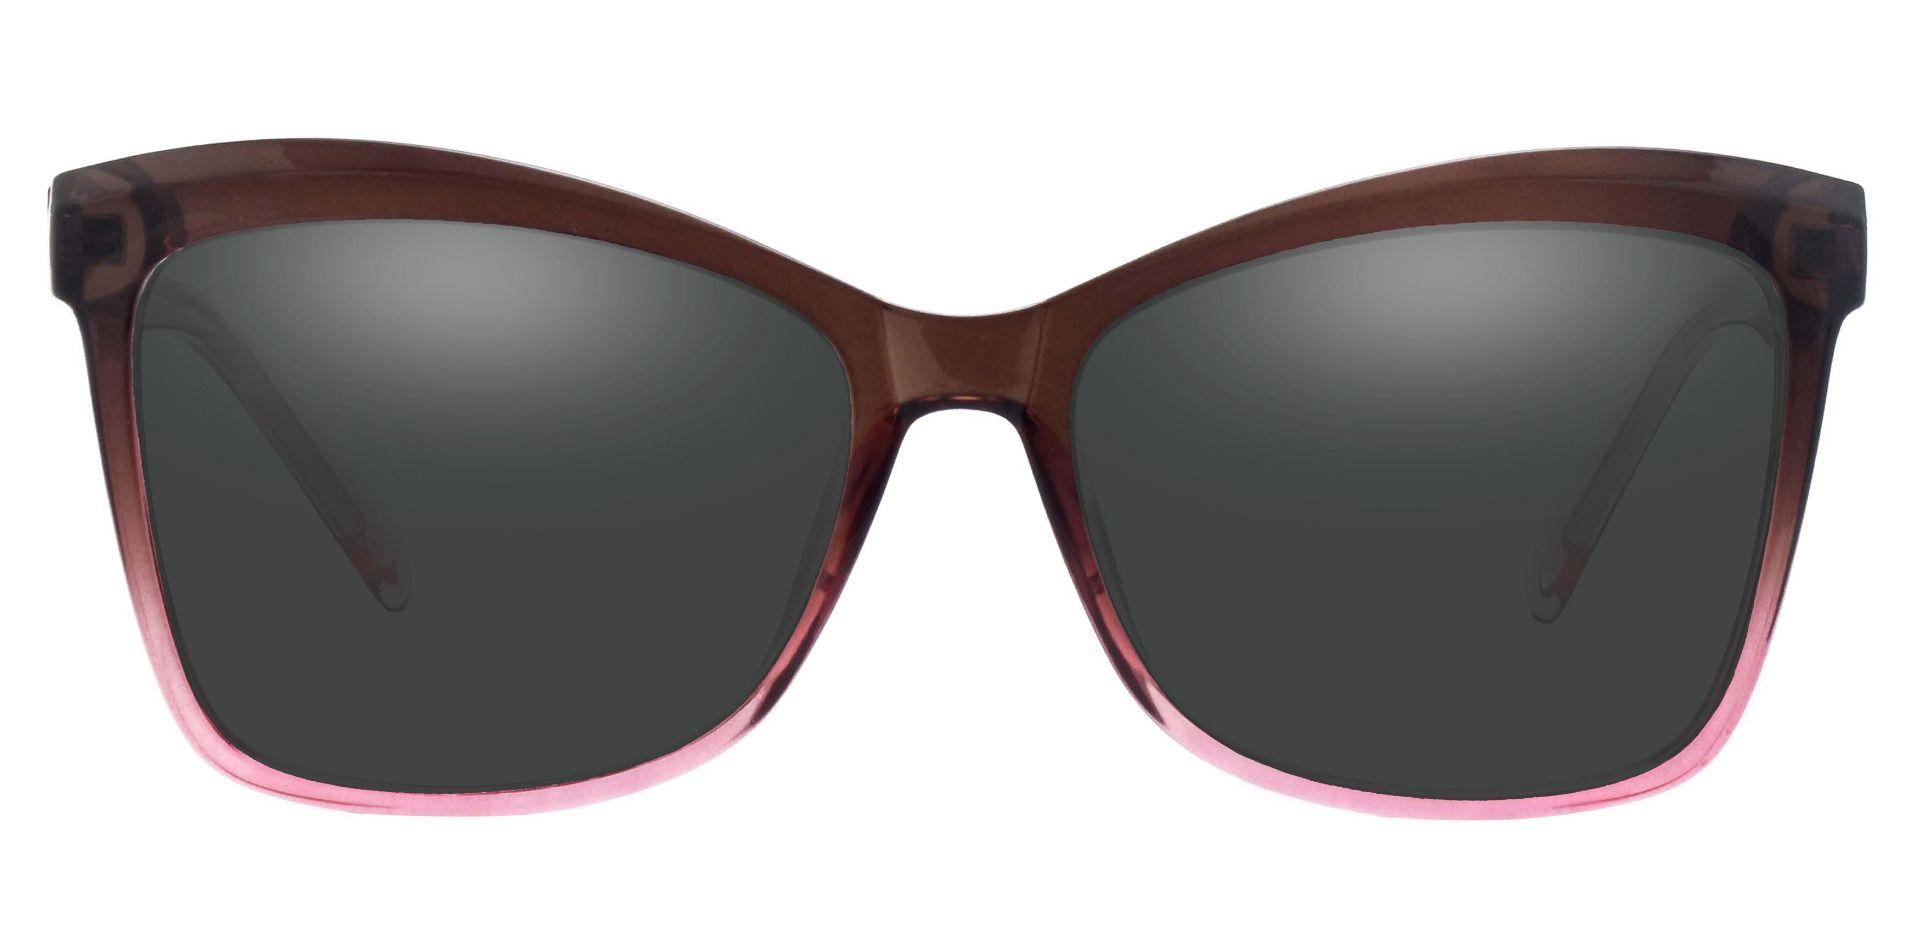 Lexi Cat Eye Prescription Sunglasses - Brown Frame With Gray Lenses